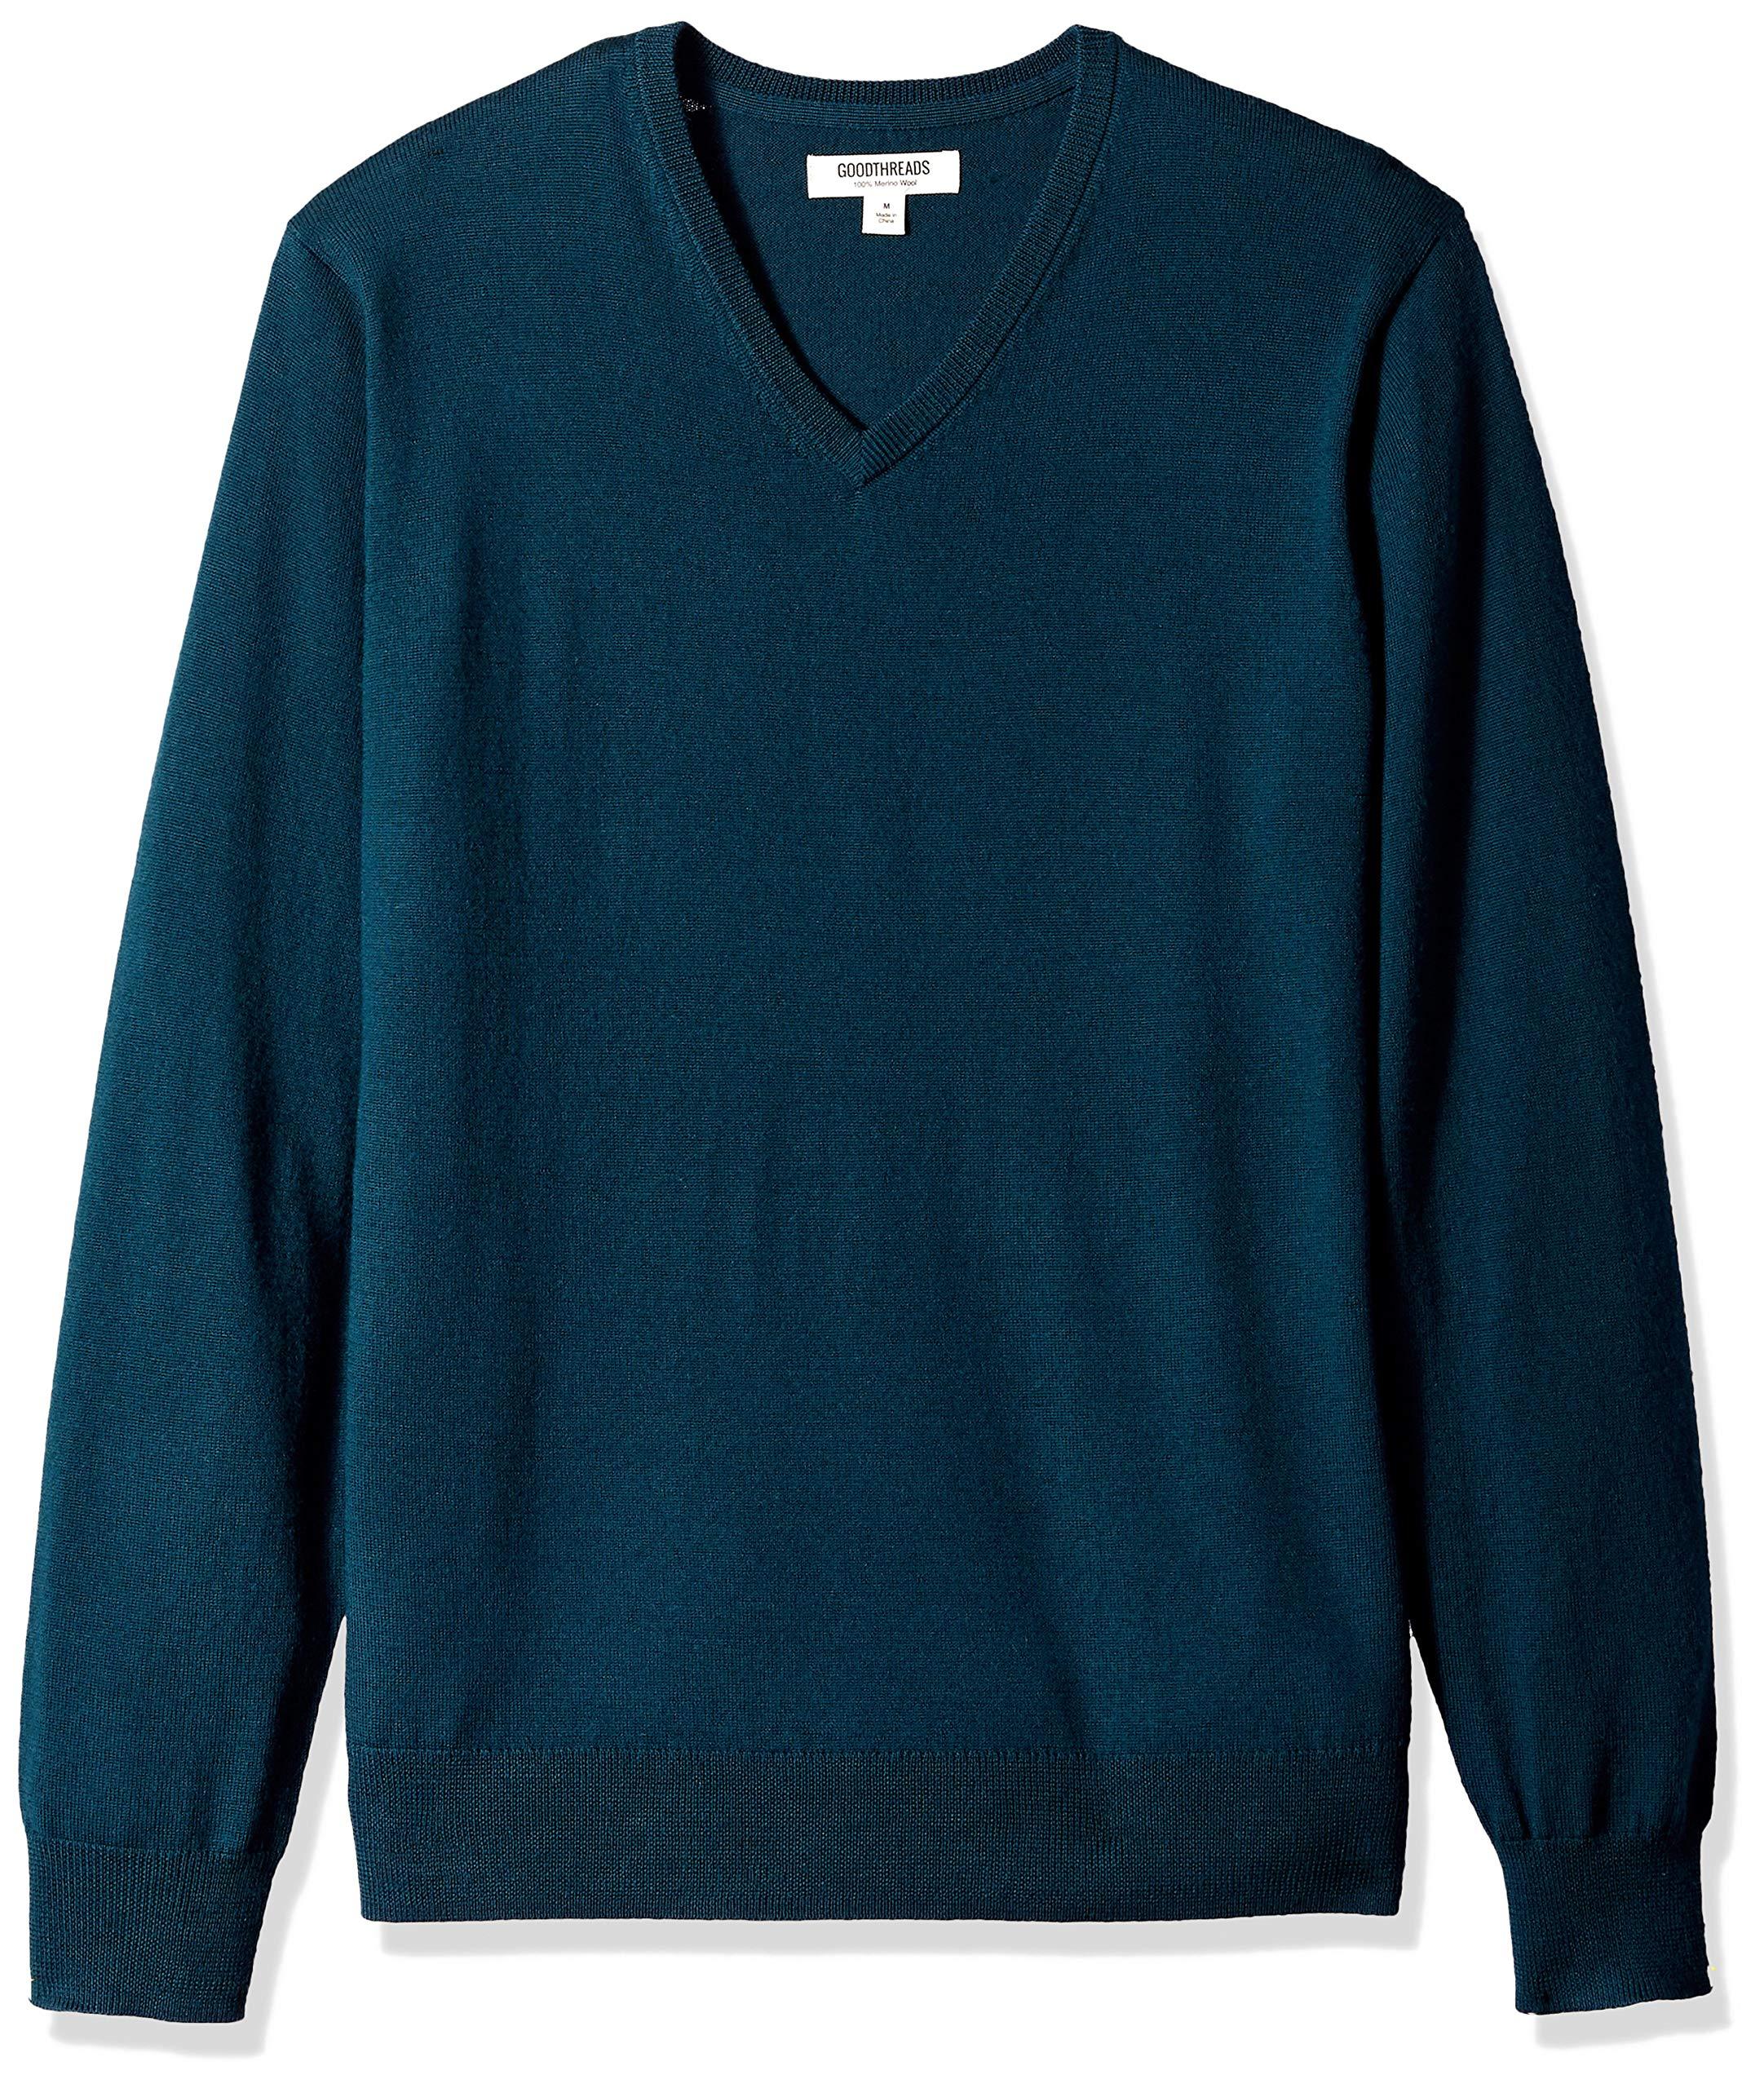 Goodthreads Men's Merino Wool V-Neck Sweater, deep Teal, Medium